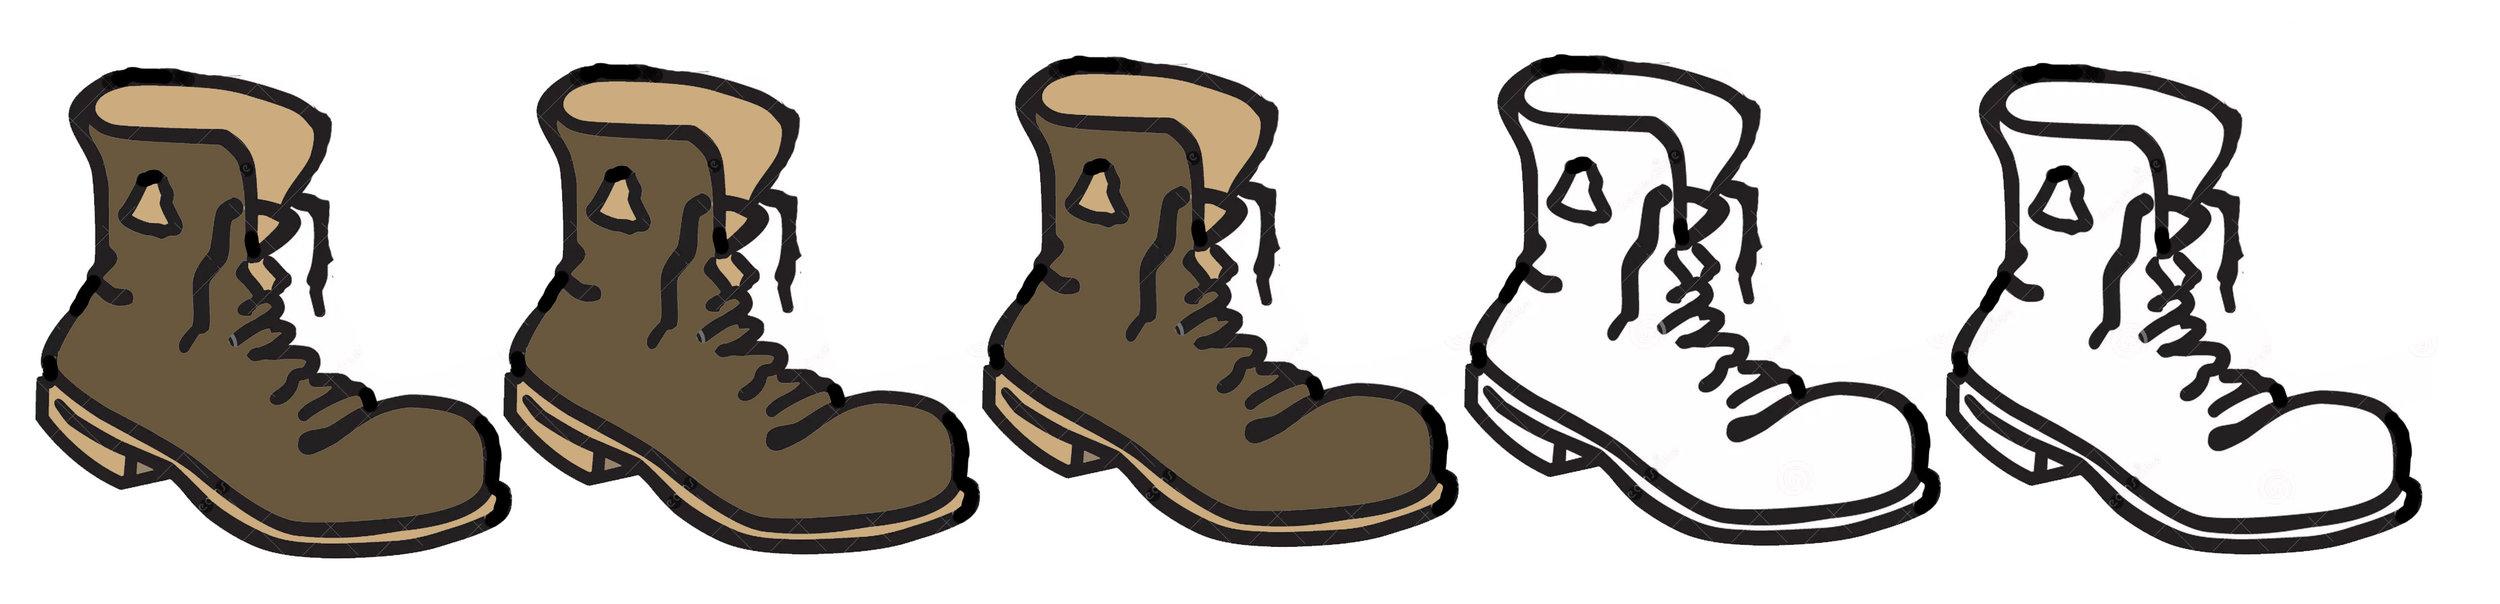 3 boot.jpg